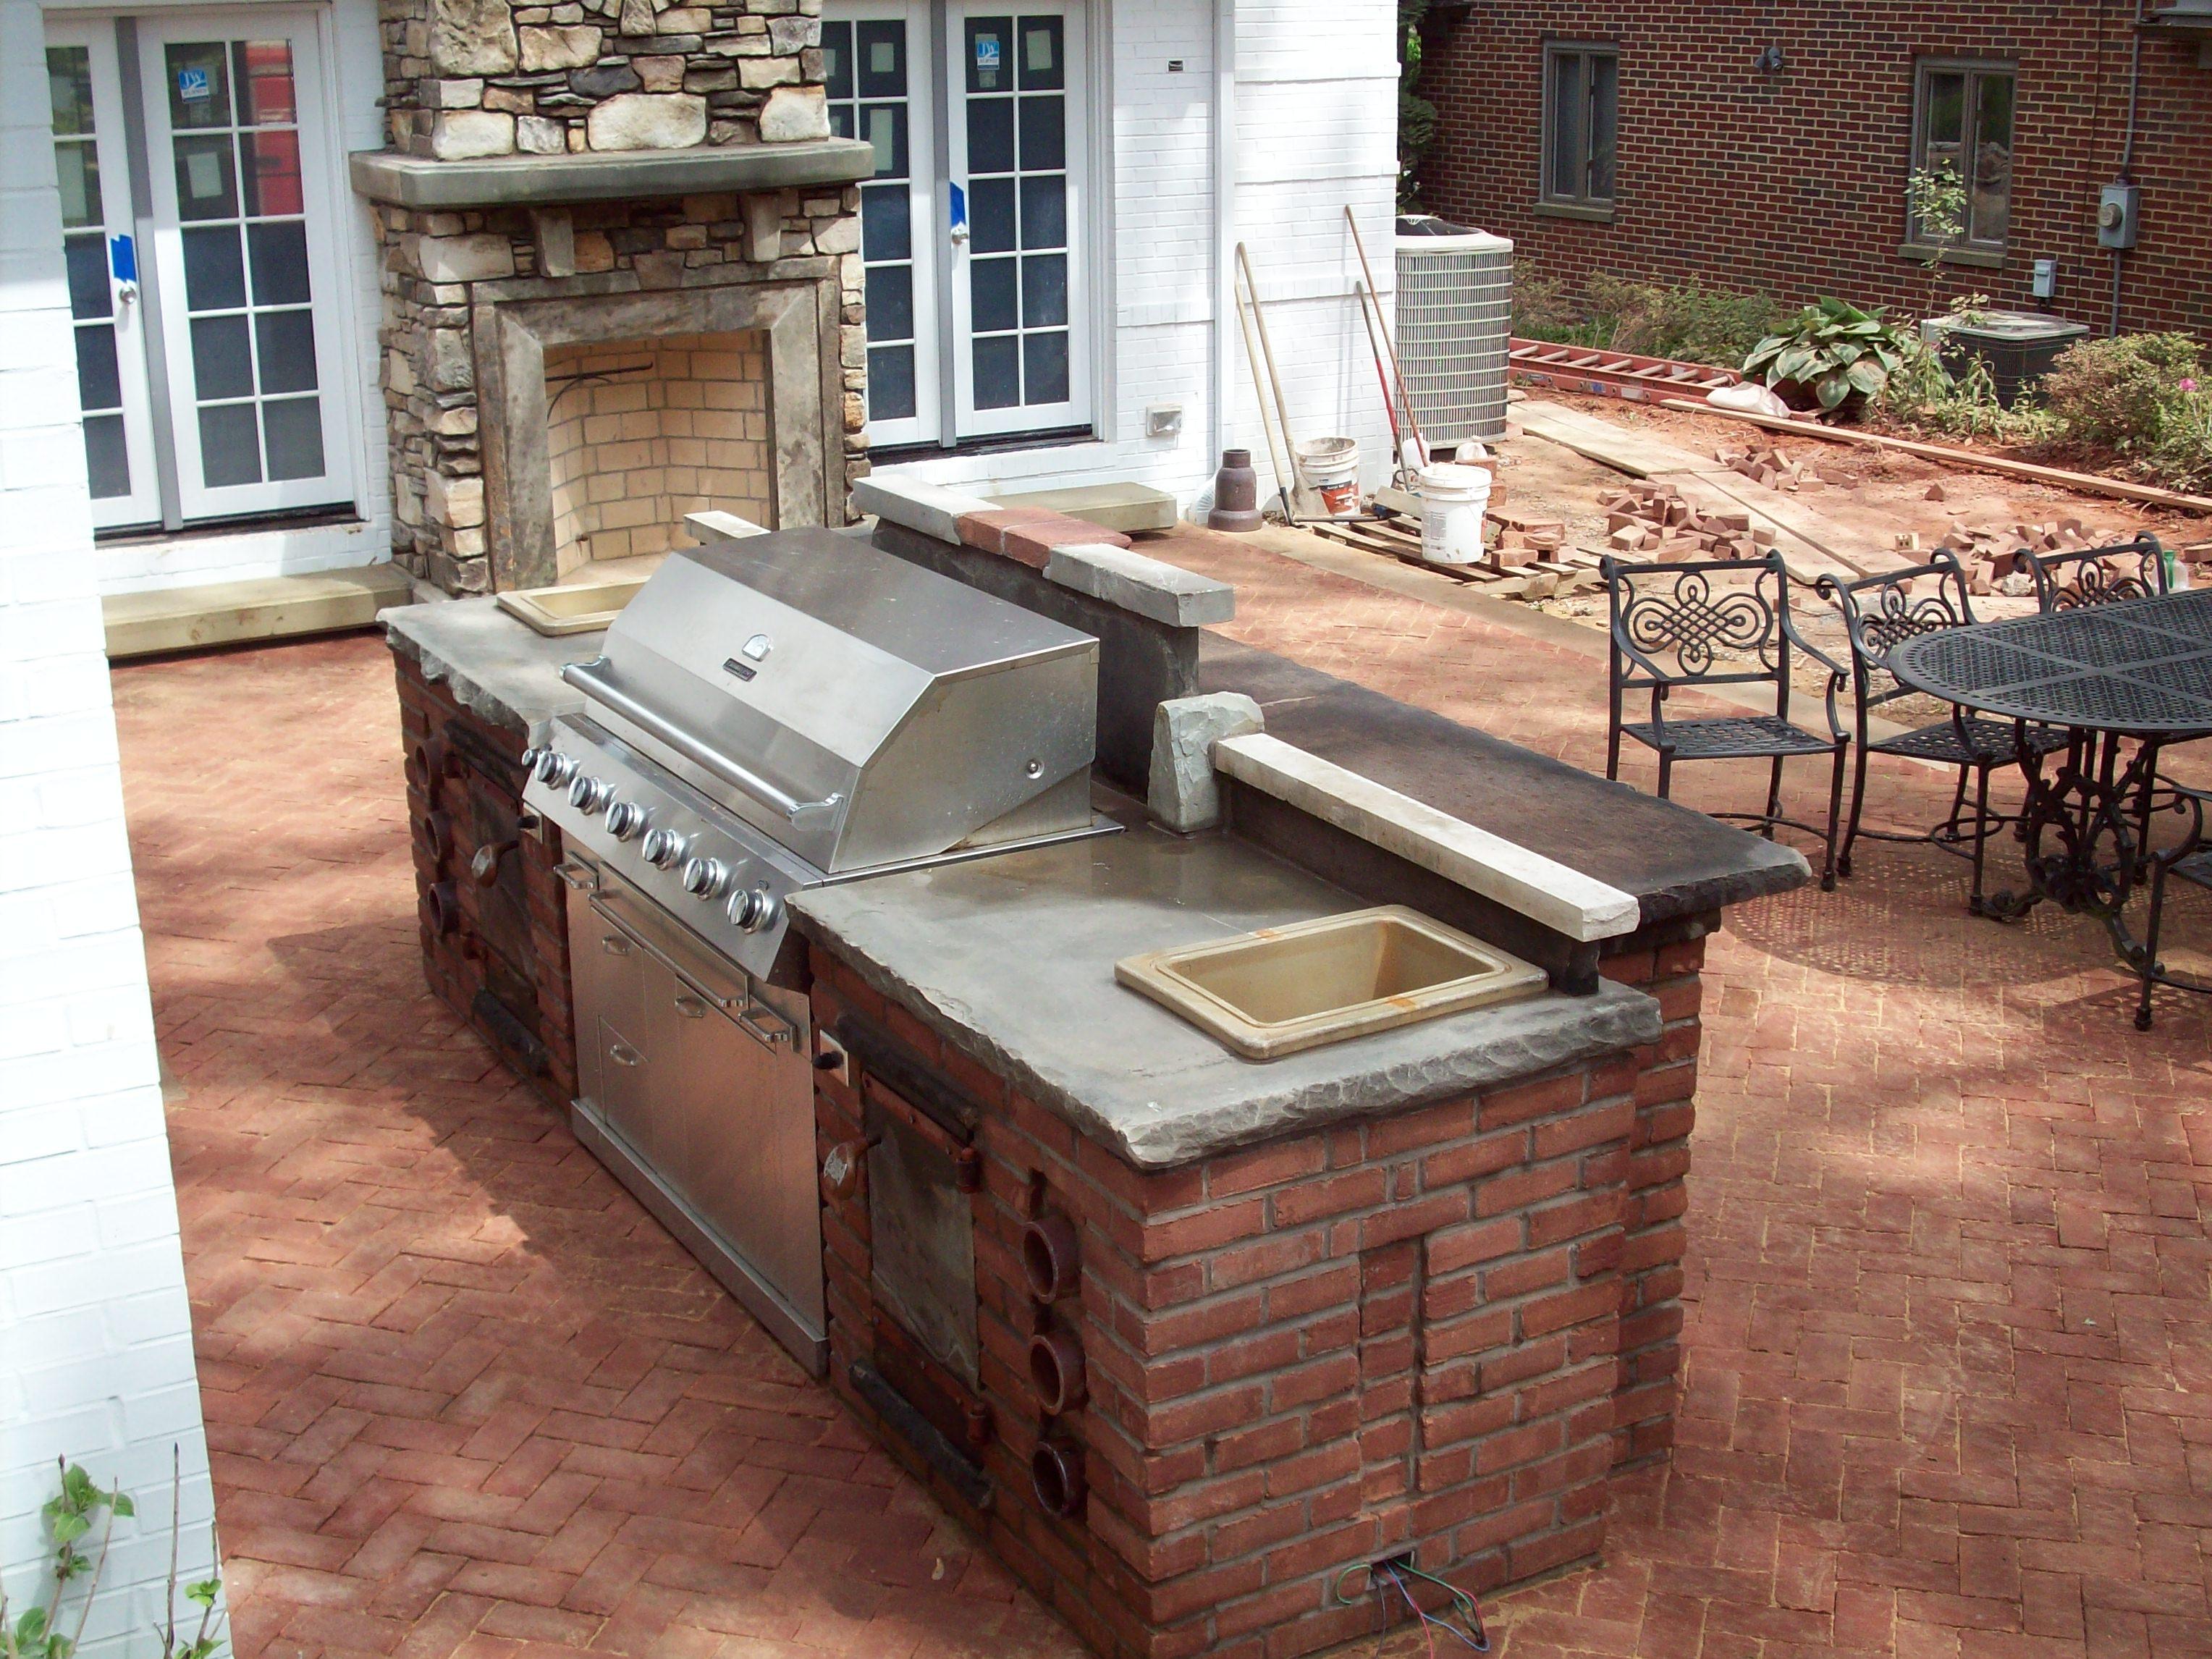 Detail: Outdoor bar, grill, sink | Yoder Masonry, Inc.